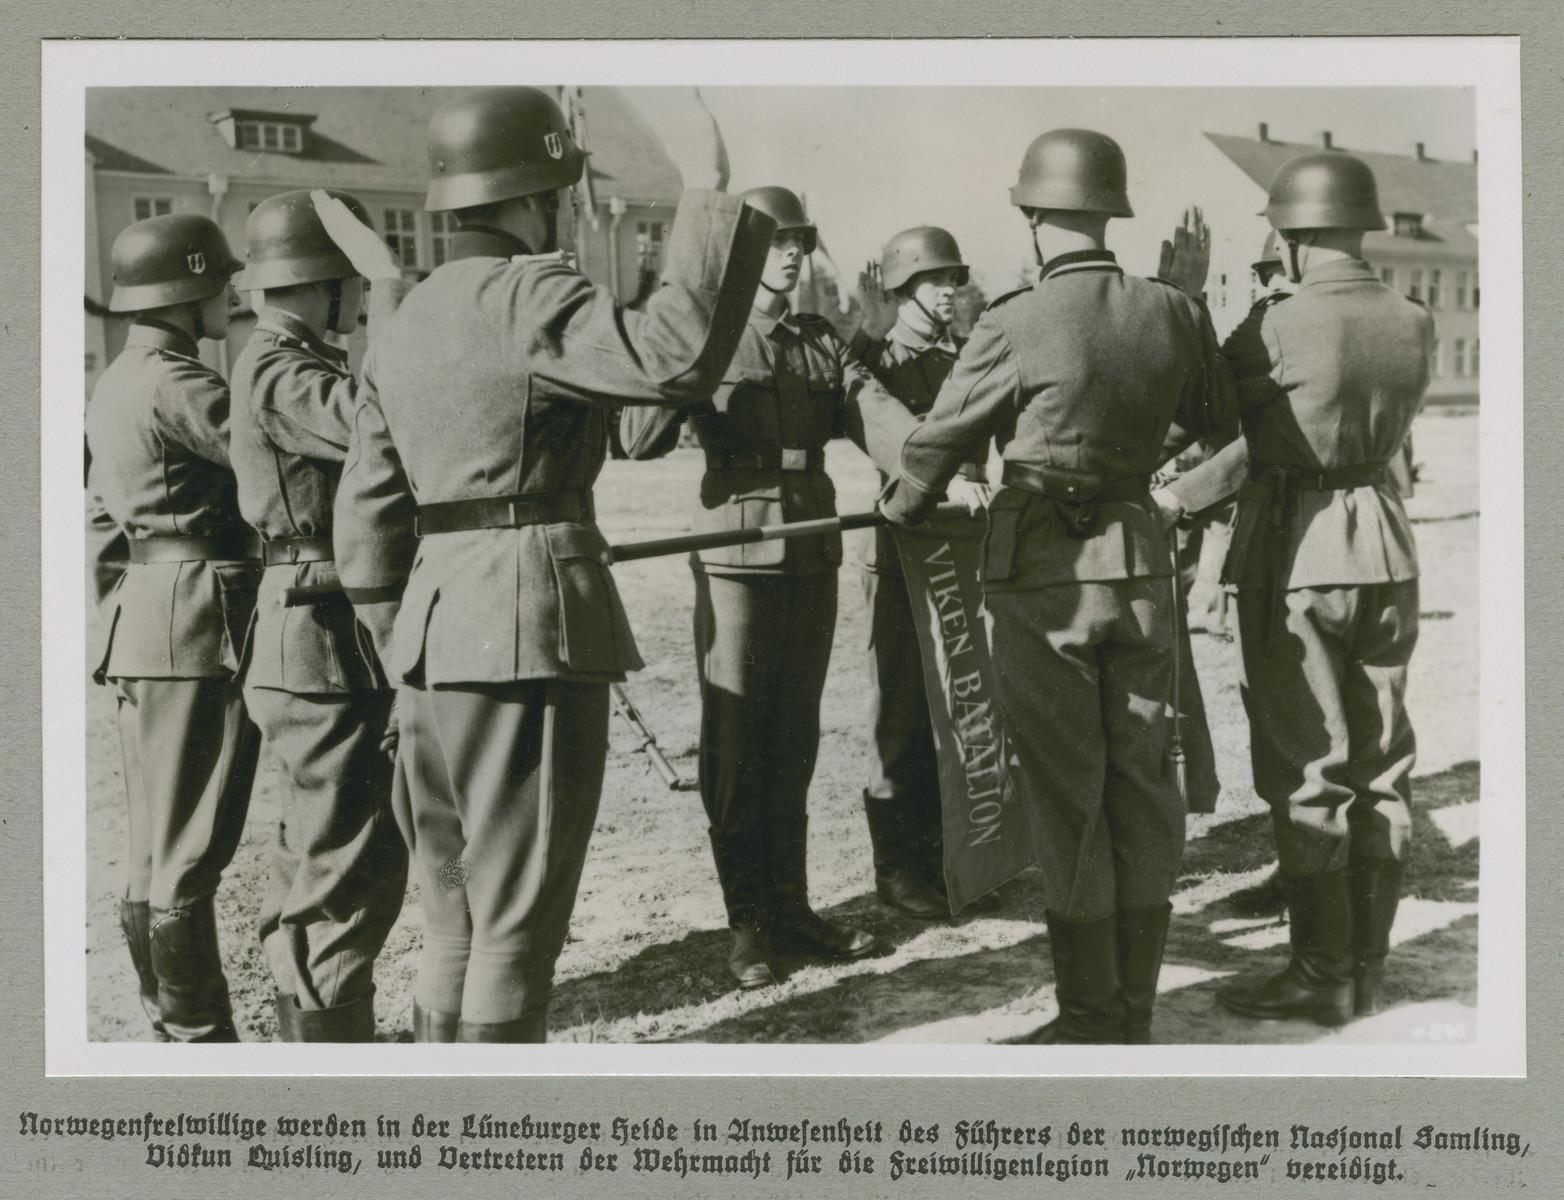 "German soldiers take an oath.  Original caption reads: Norwegian volunteers are sworn in before the leader of the Norwegian Nasjonal Samling Party, Vidkun Quisling, and representatives of the volunteer legion ""Norway"" on the Lüneburg Heath."